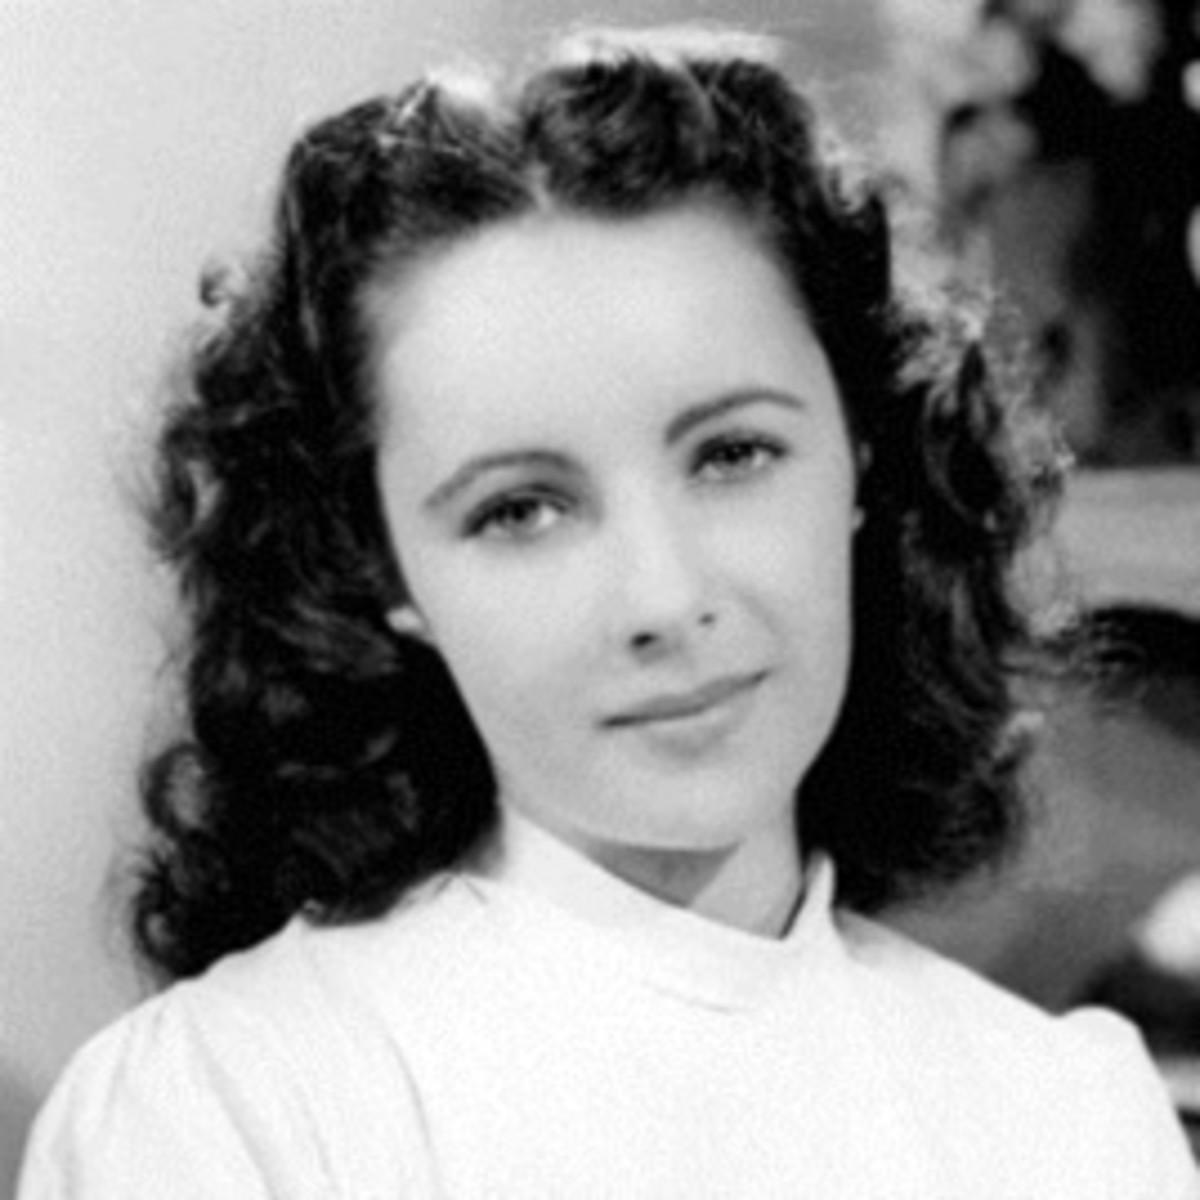 Elizabeth Taylor, 14 years old, 1946